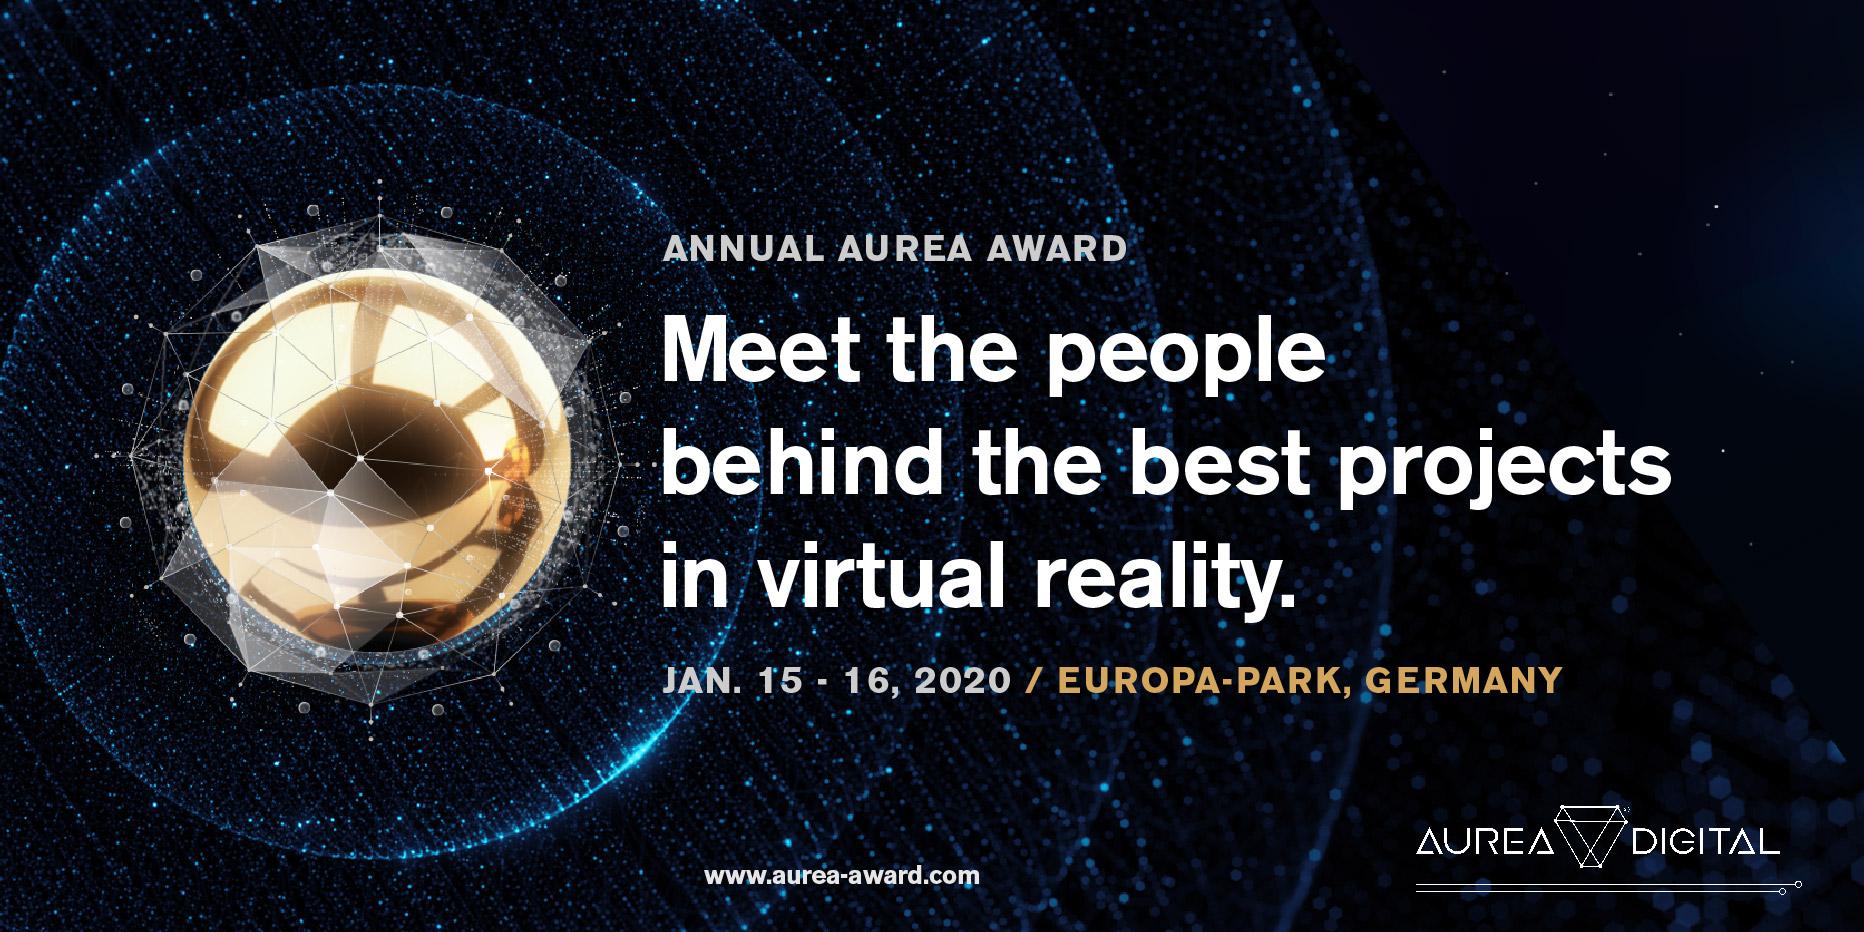 Aurea_Digital_Classic_Award_1C_W-07.jpg